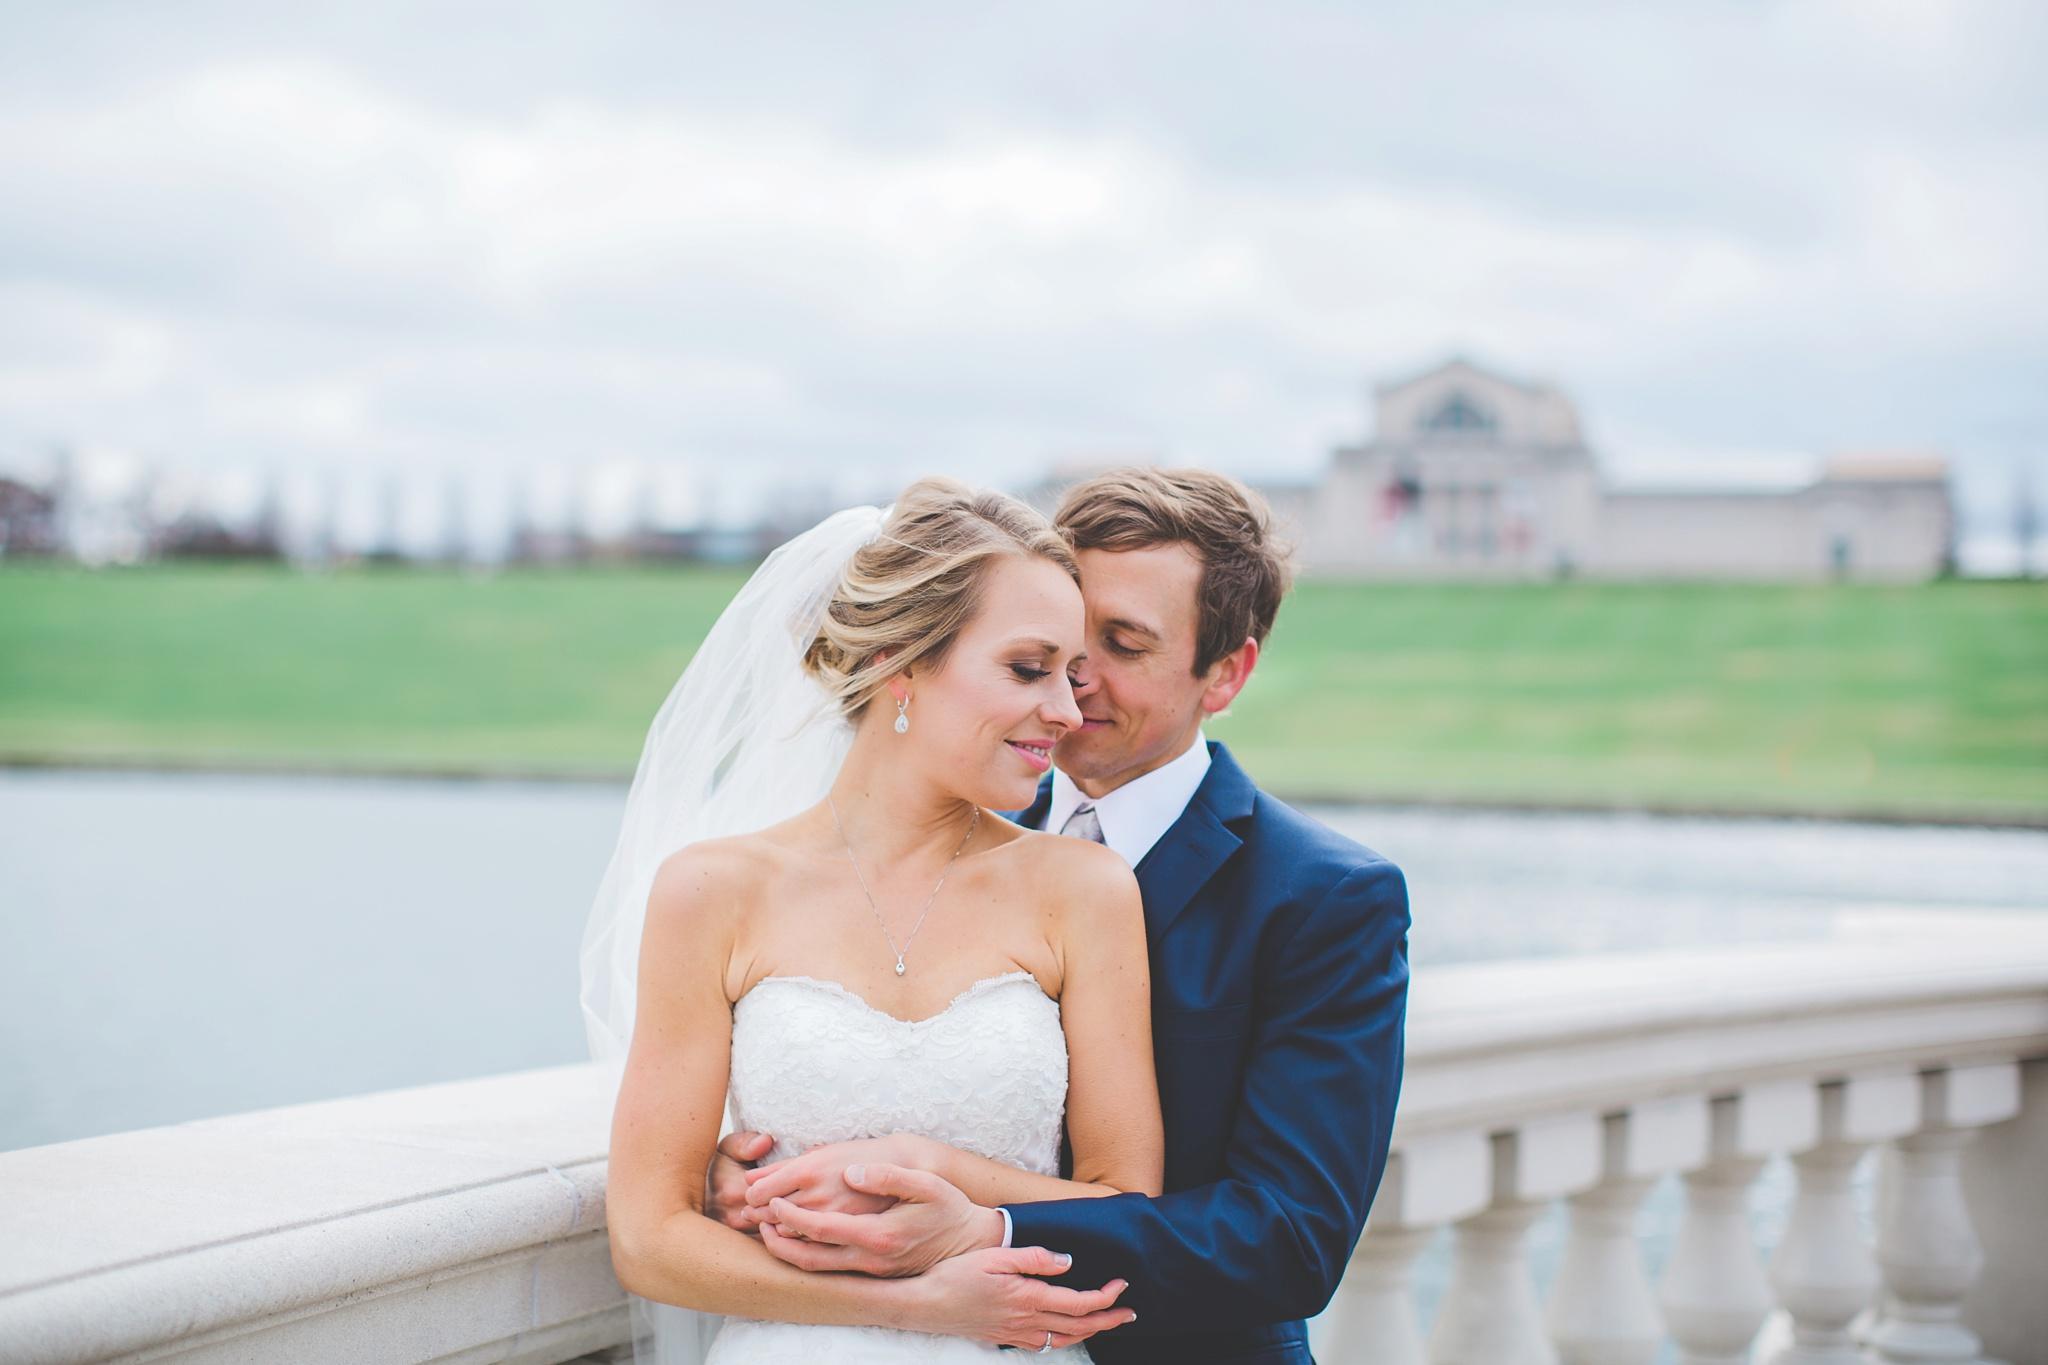 St. Louis Wedding Photographer   Chandler Rose Photography_0026.jpg